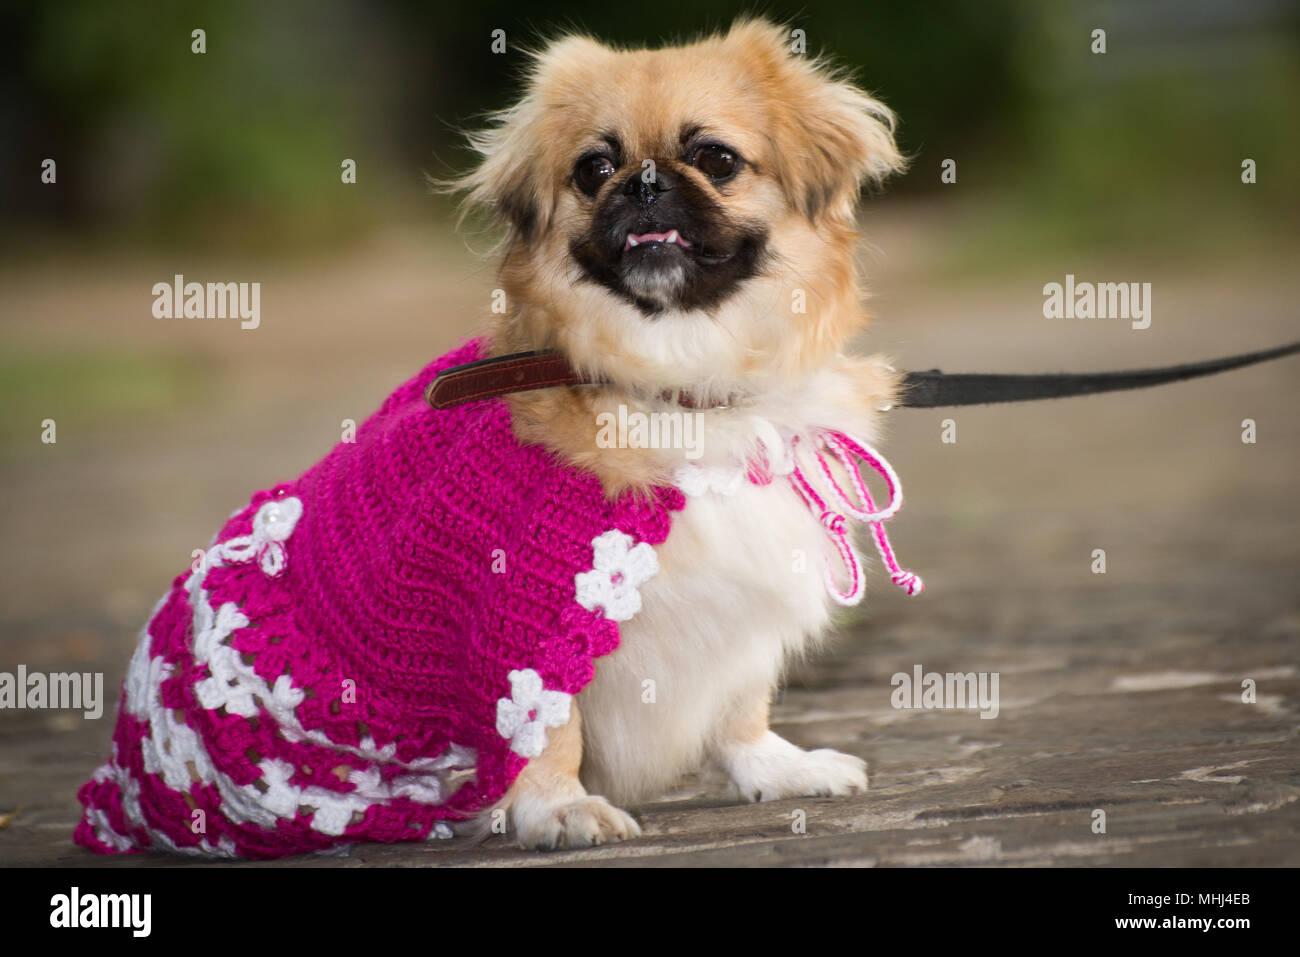 Dog Dressed Up Princess Imágenes De Stock & Dog Dressed Up Princess ...